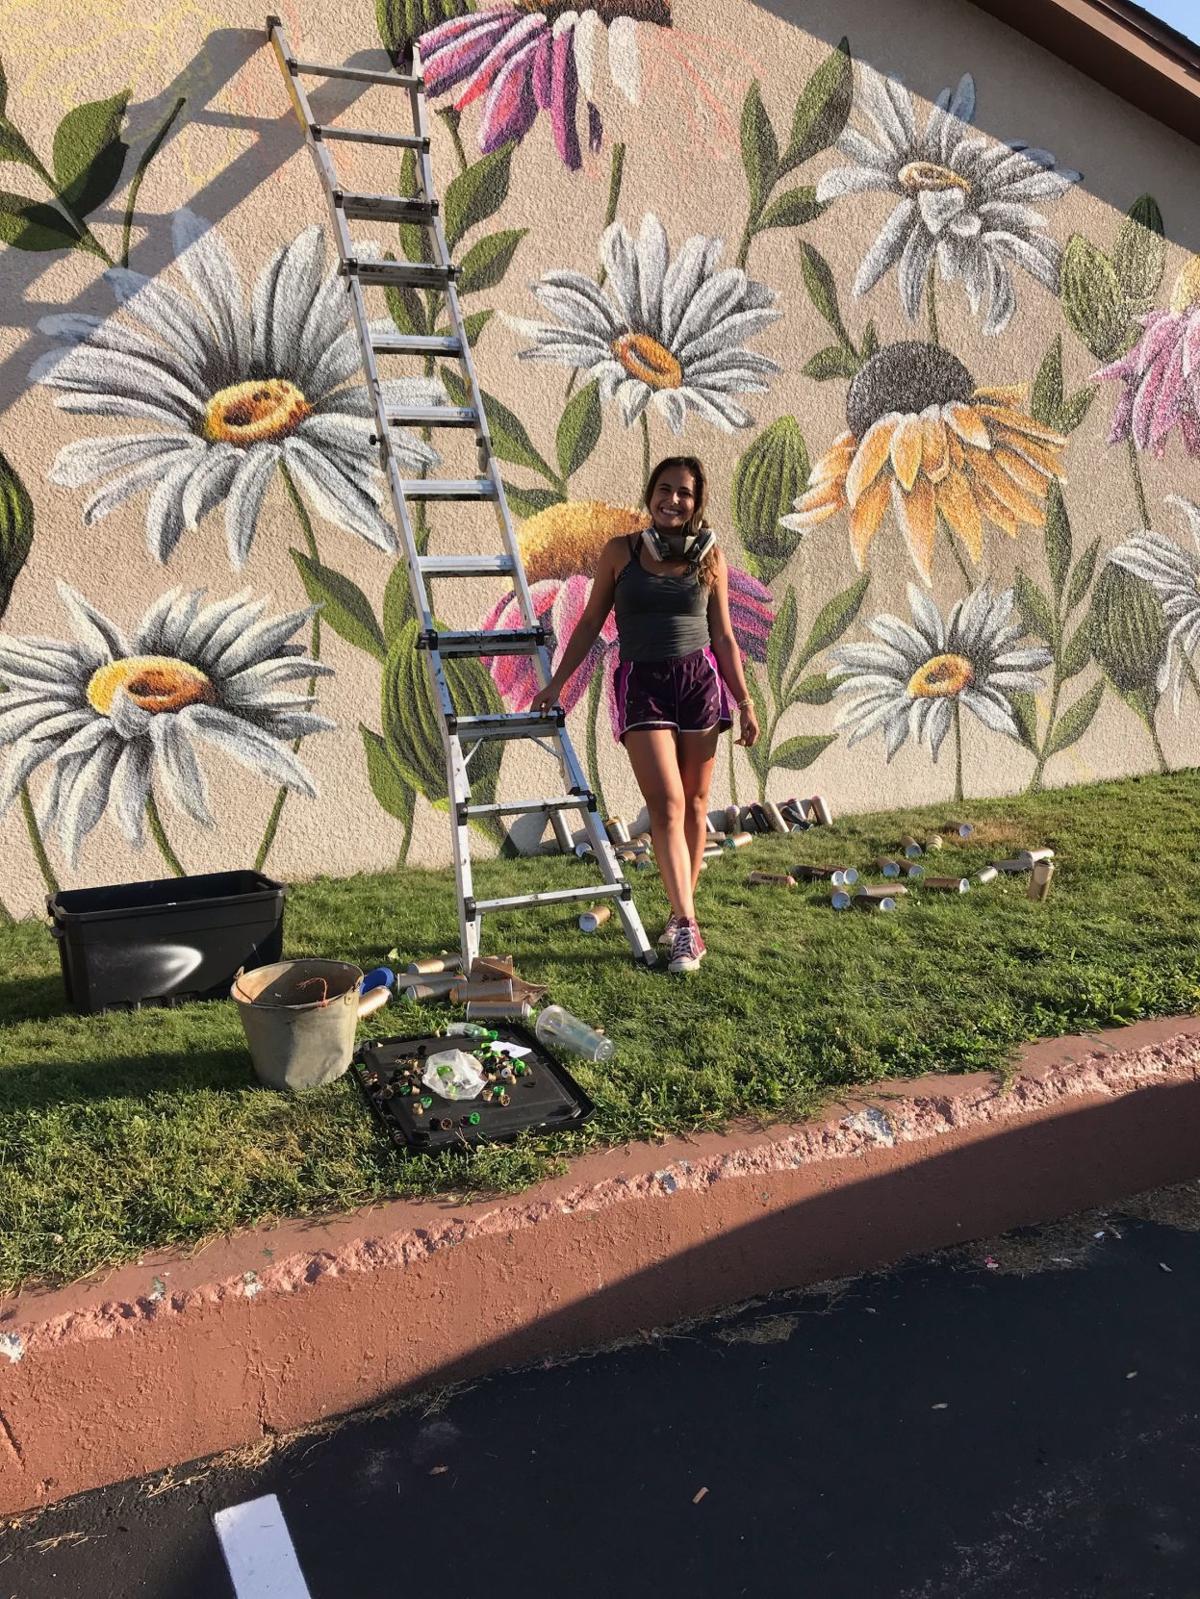 Wampach's floral scene